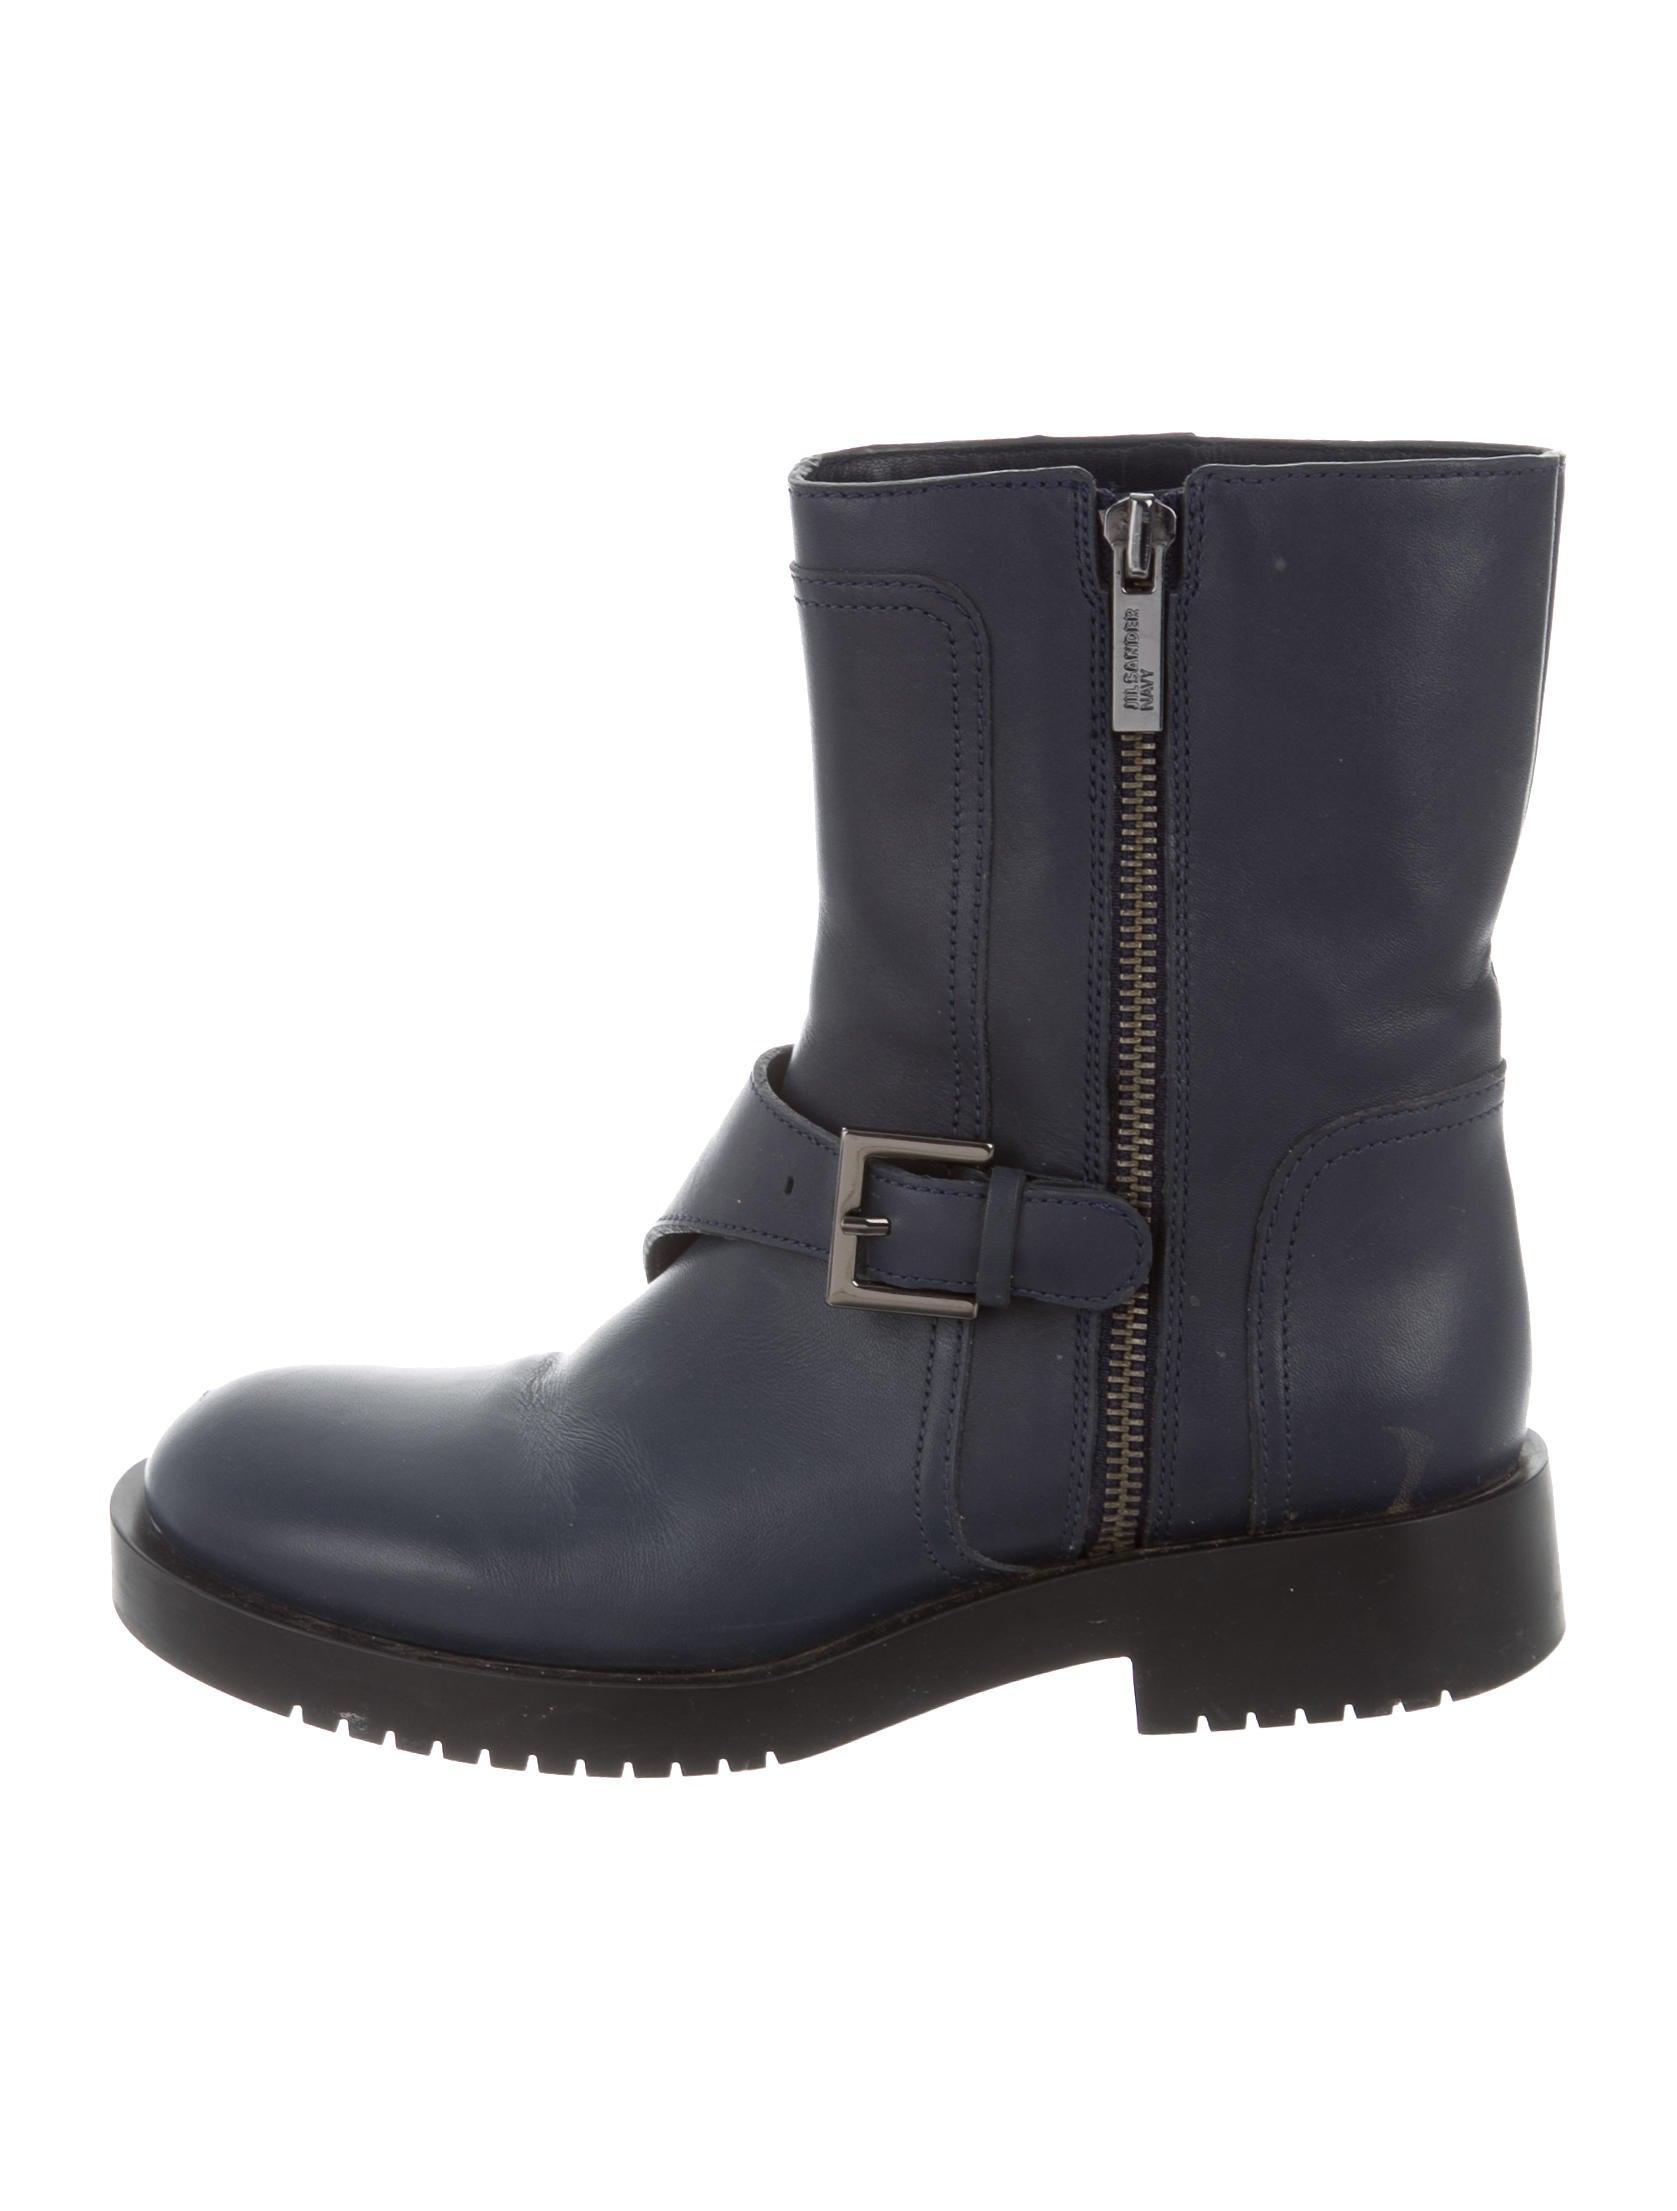 jil sander leather moto ankle boots shoes jil35358